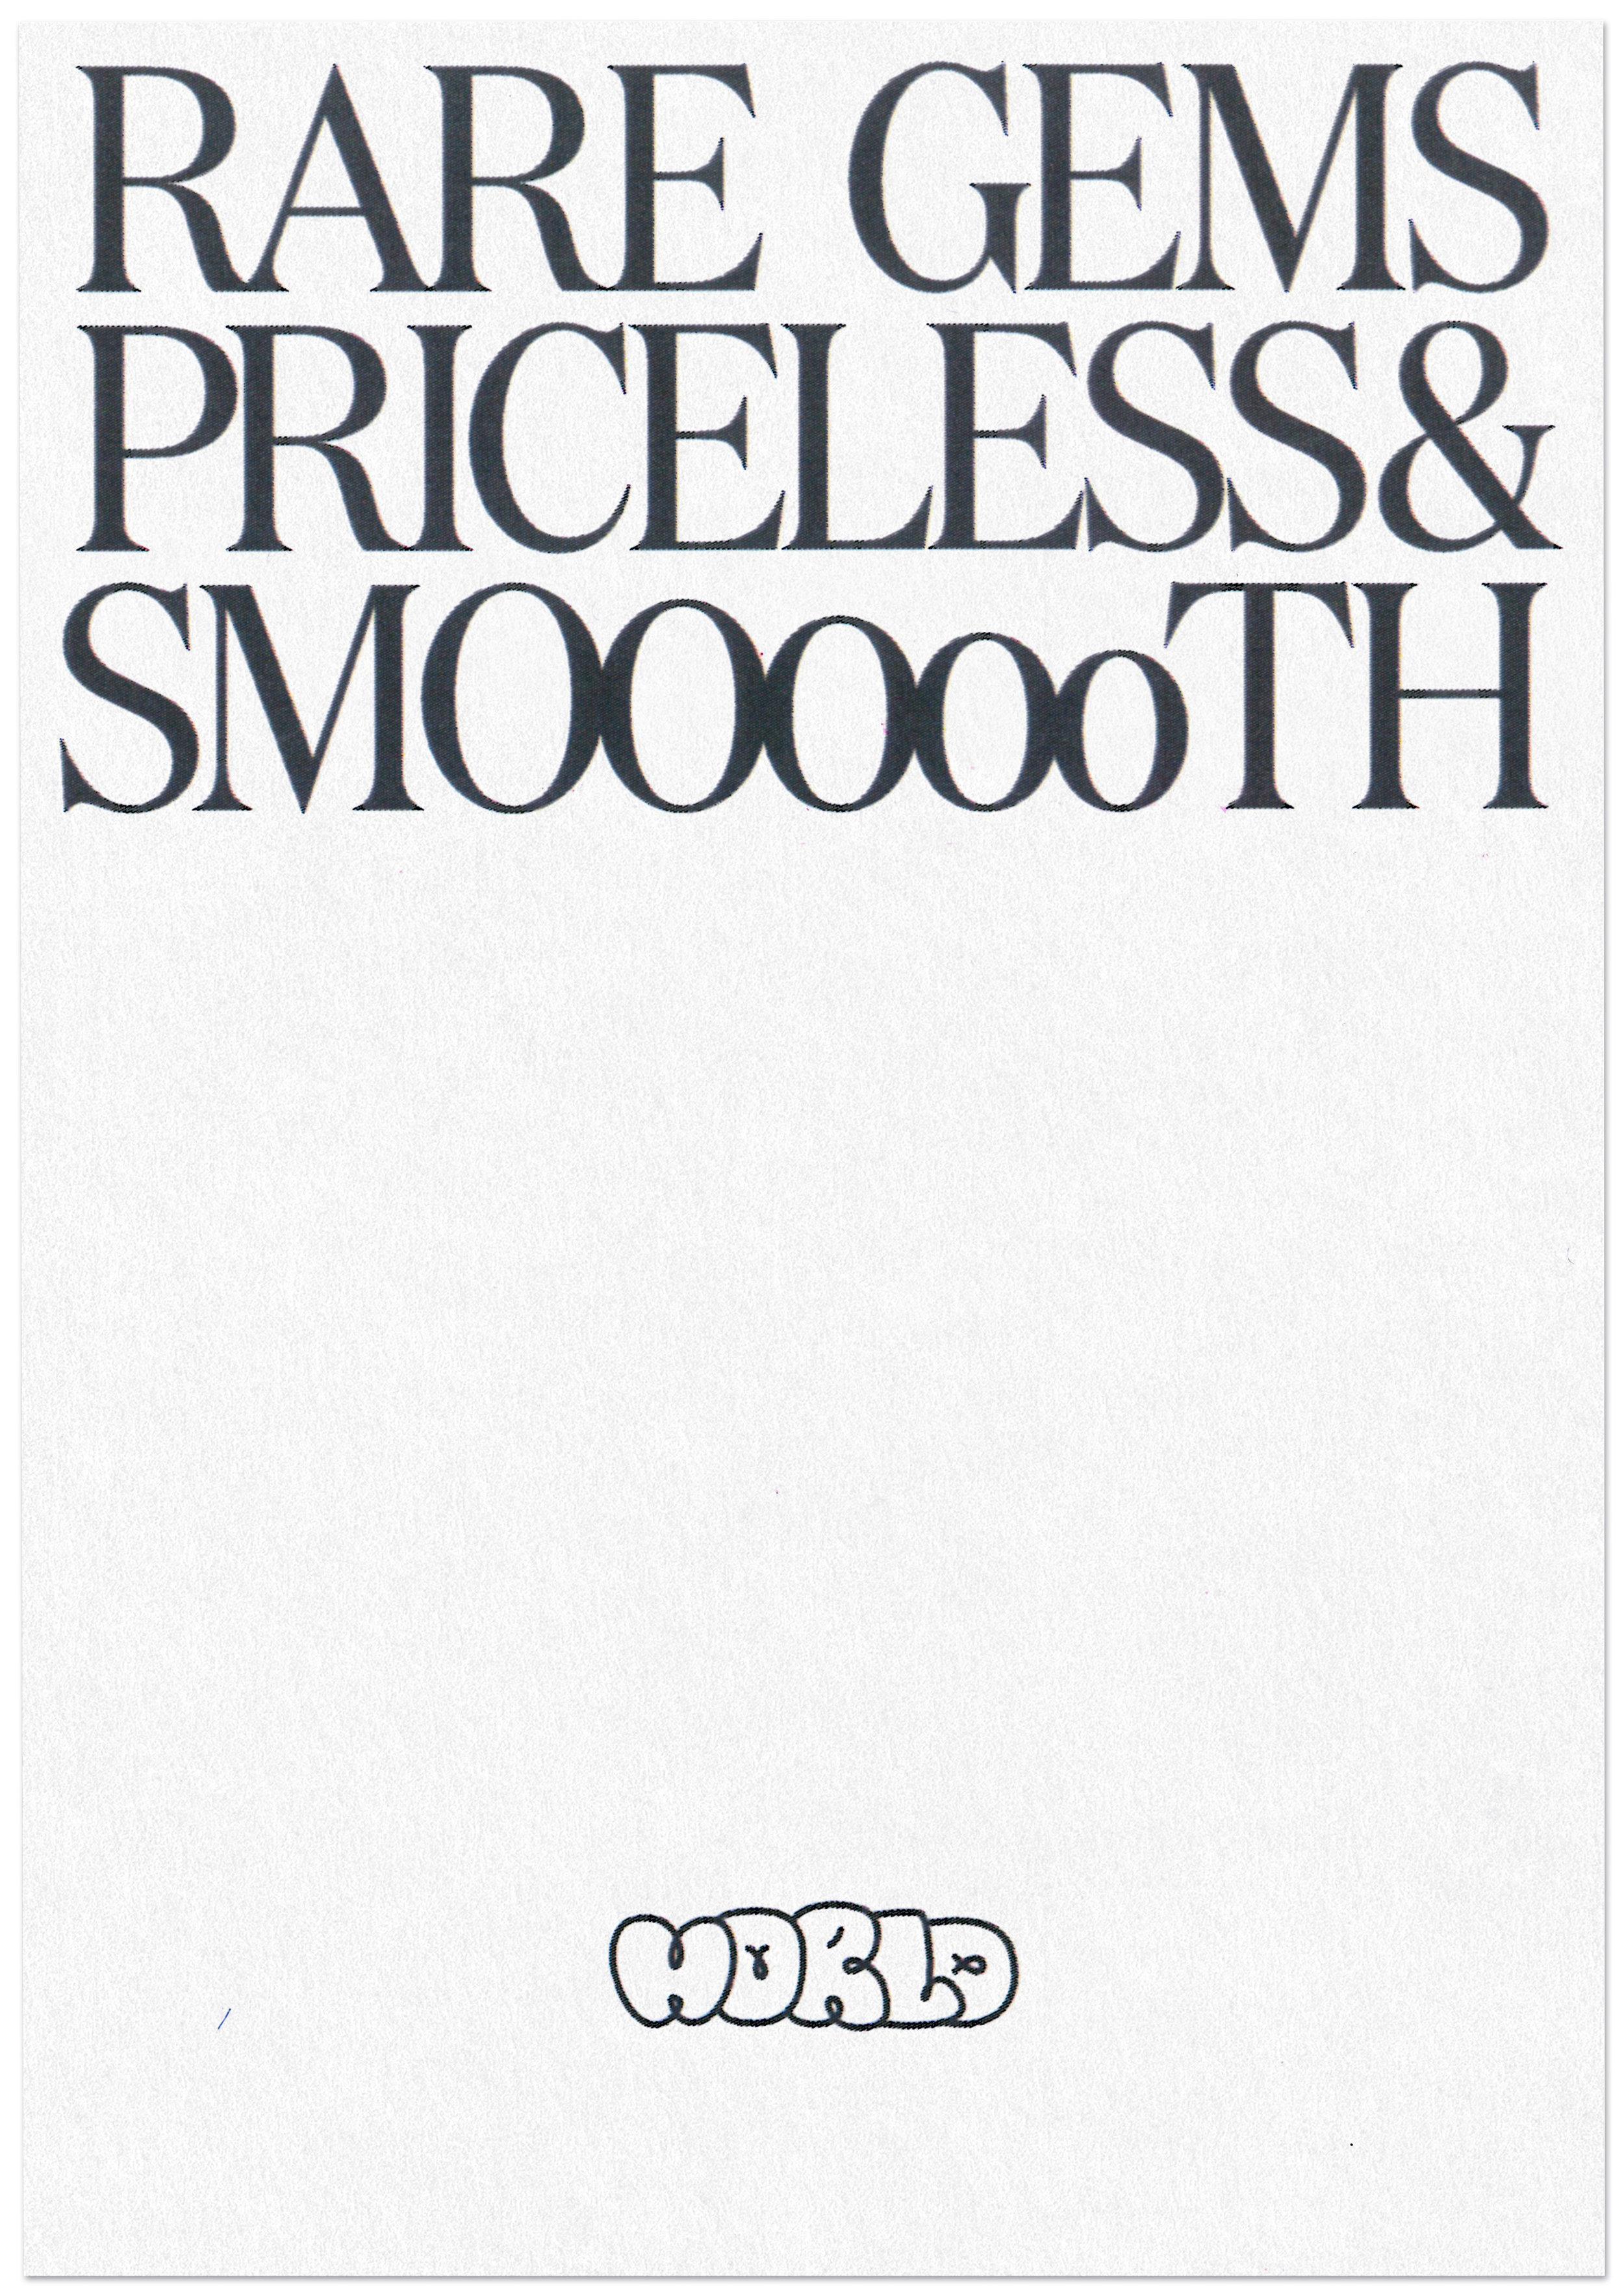 Serif typeface and thrash graff wordmark